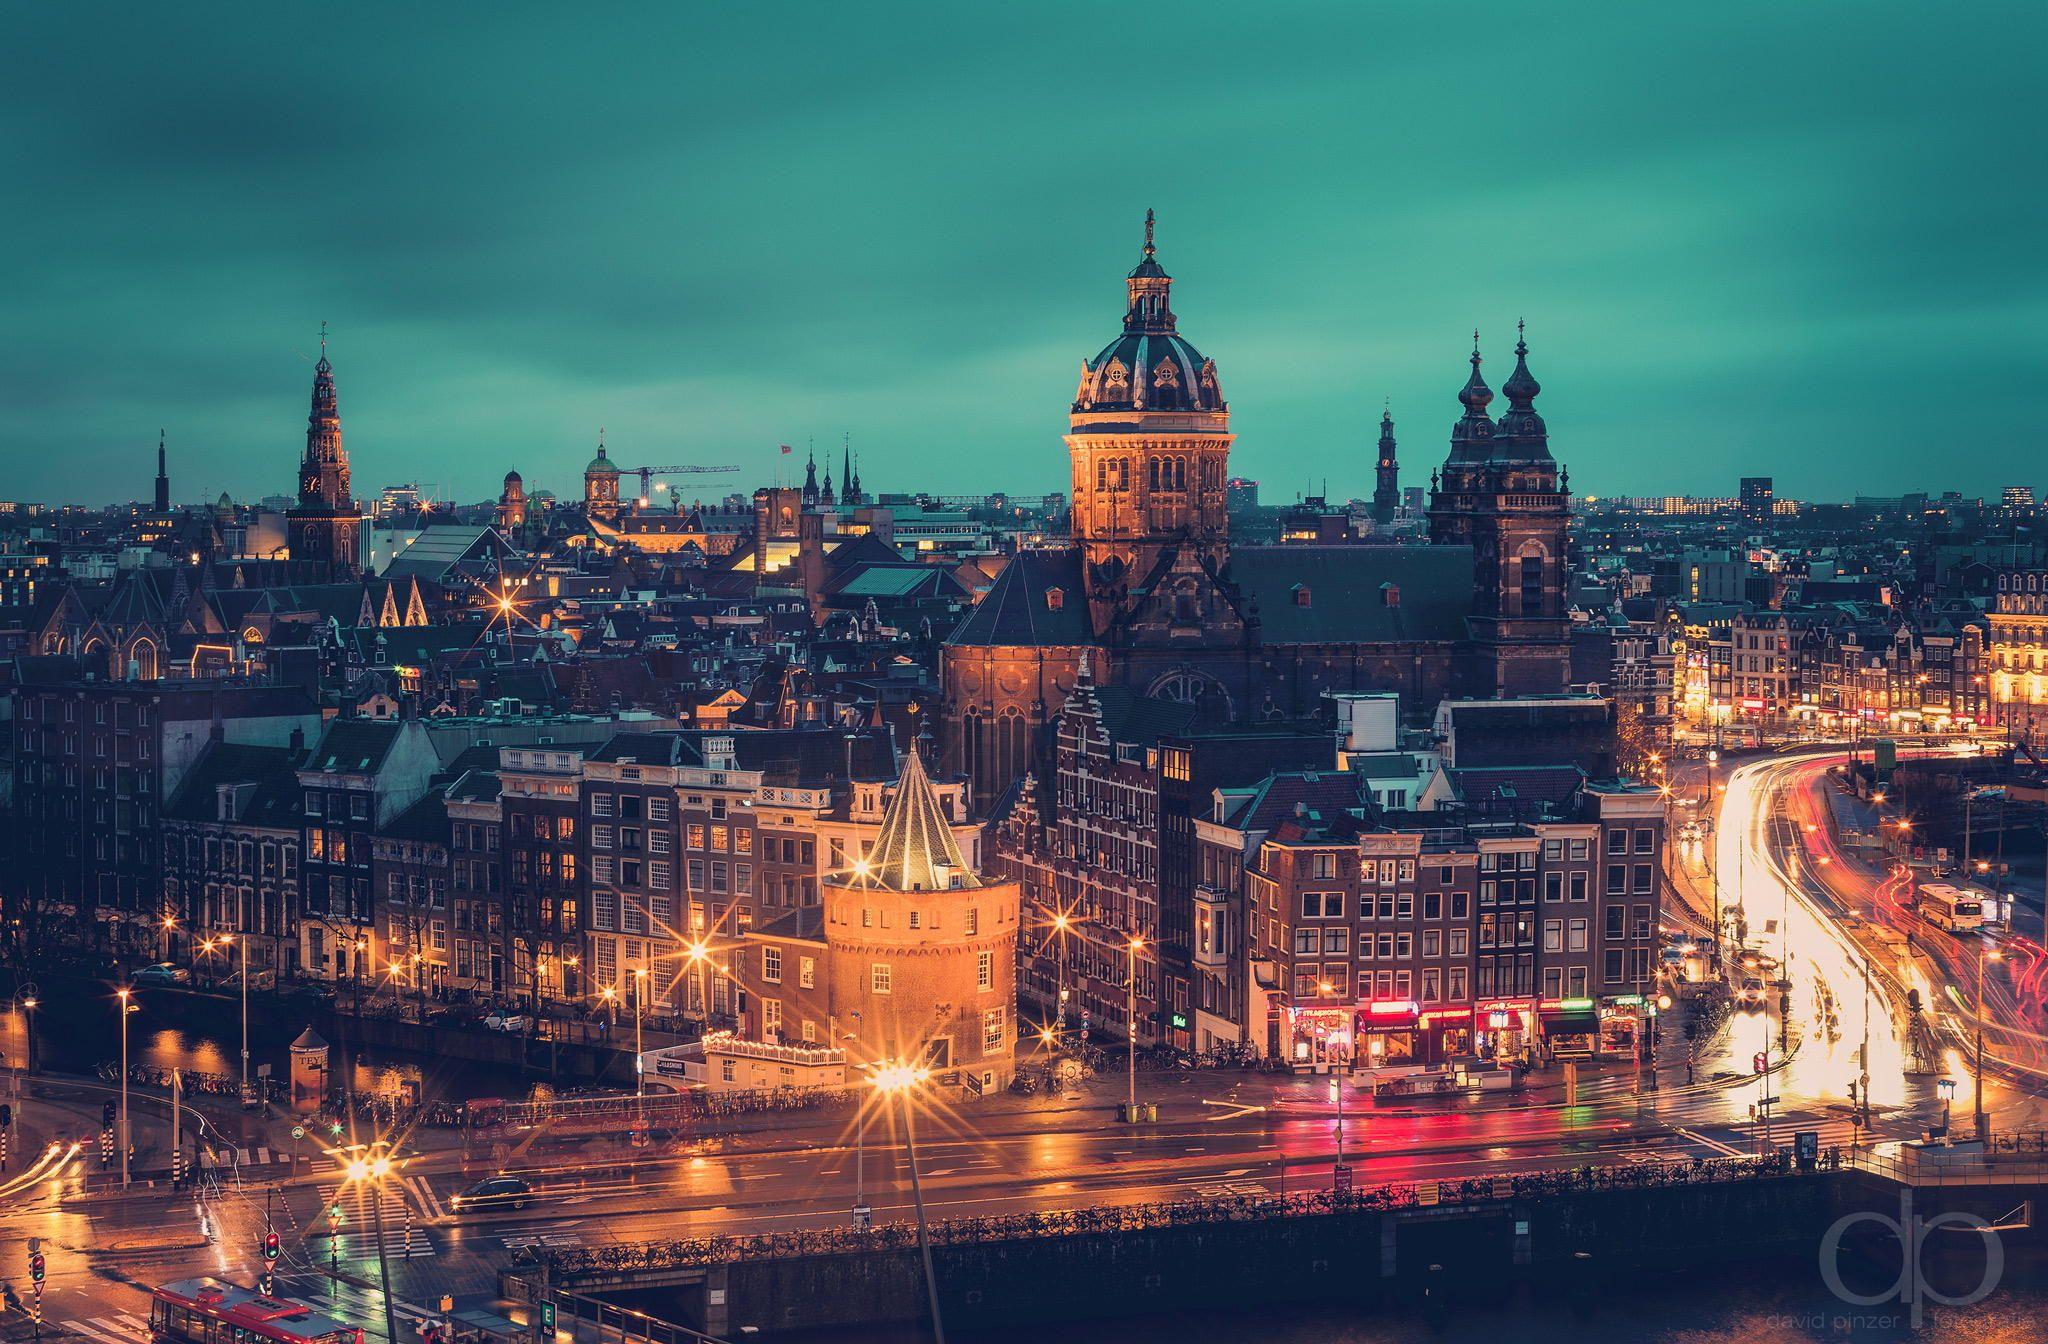 Amsterdam by David Pinzer on 500px